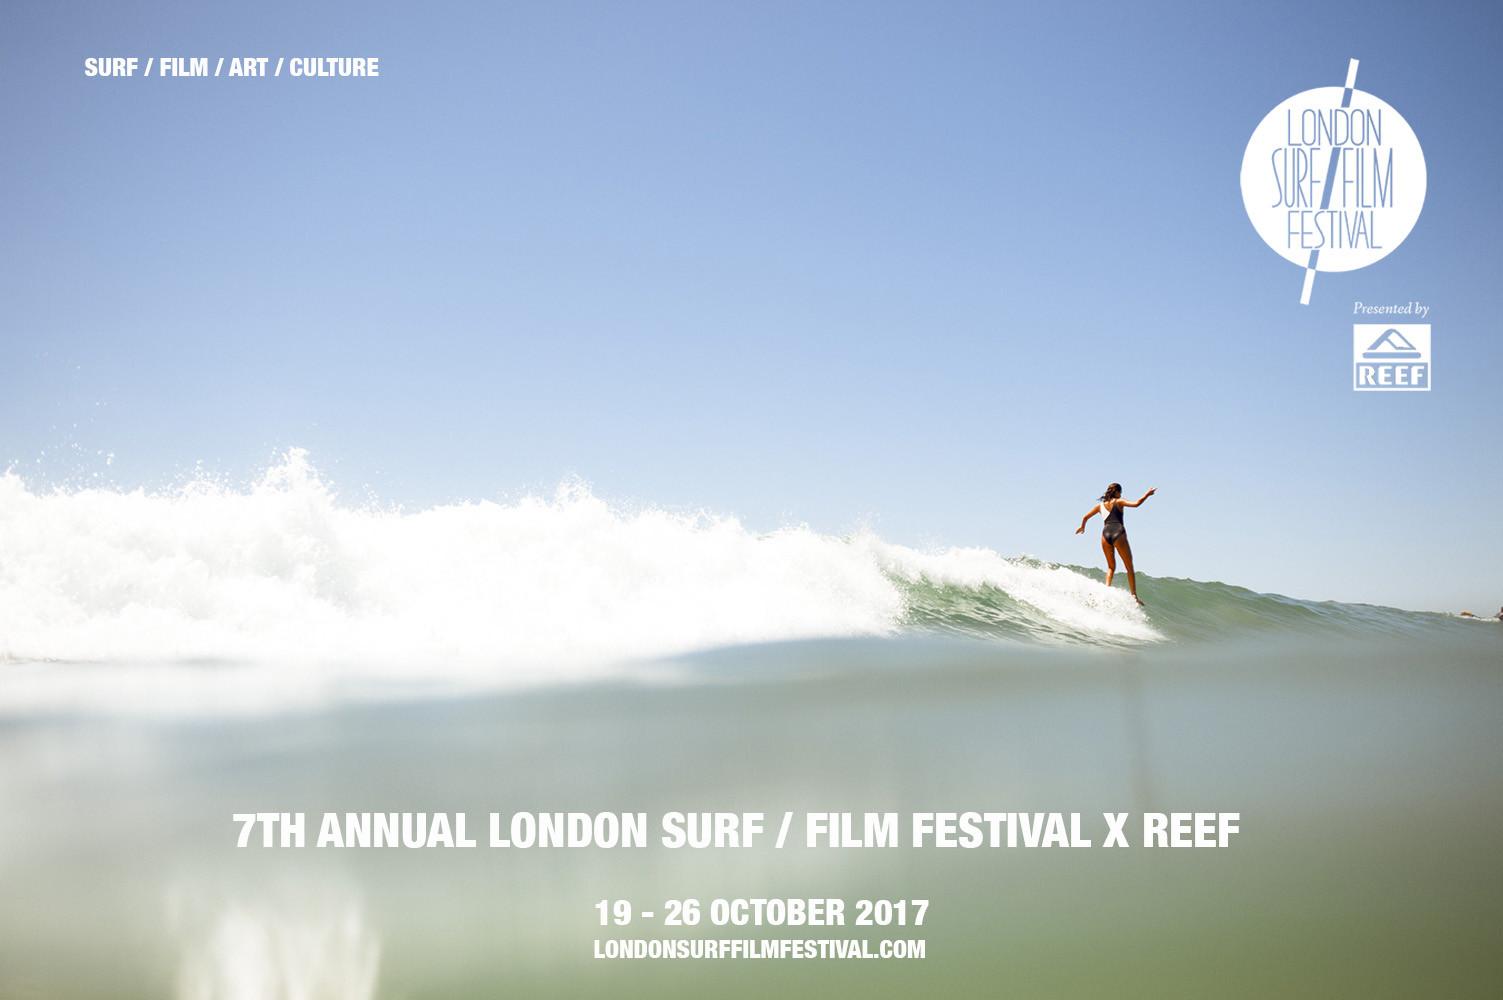 The London Surf / Film Festival